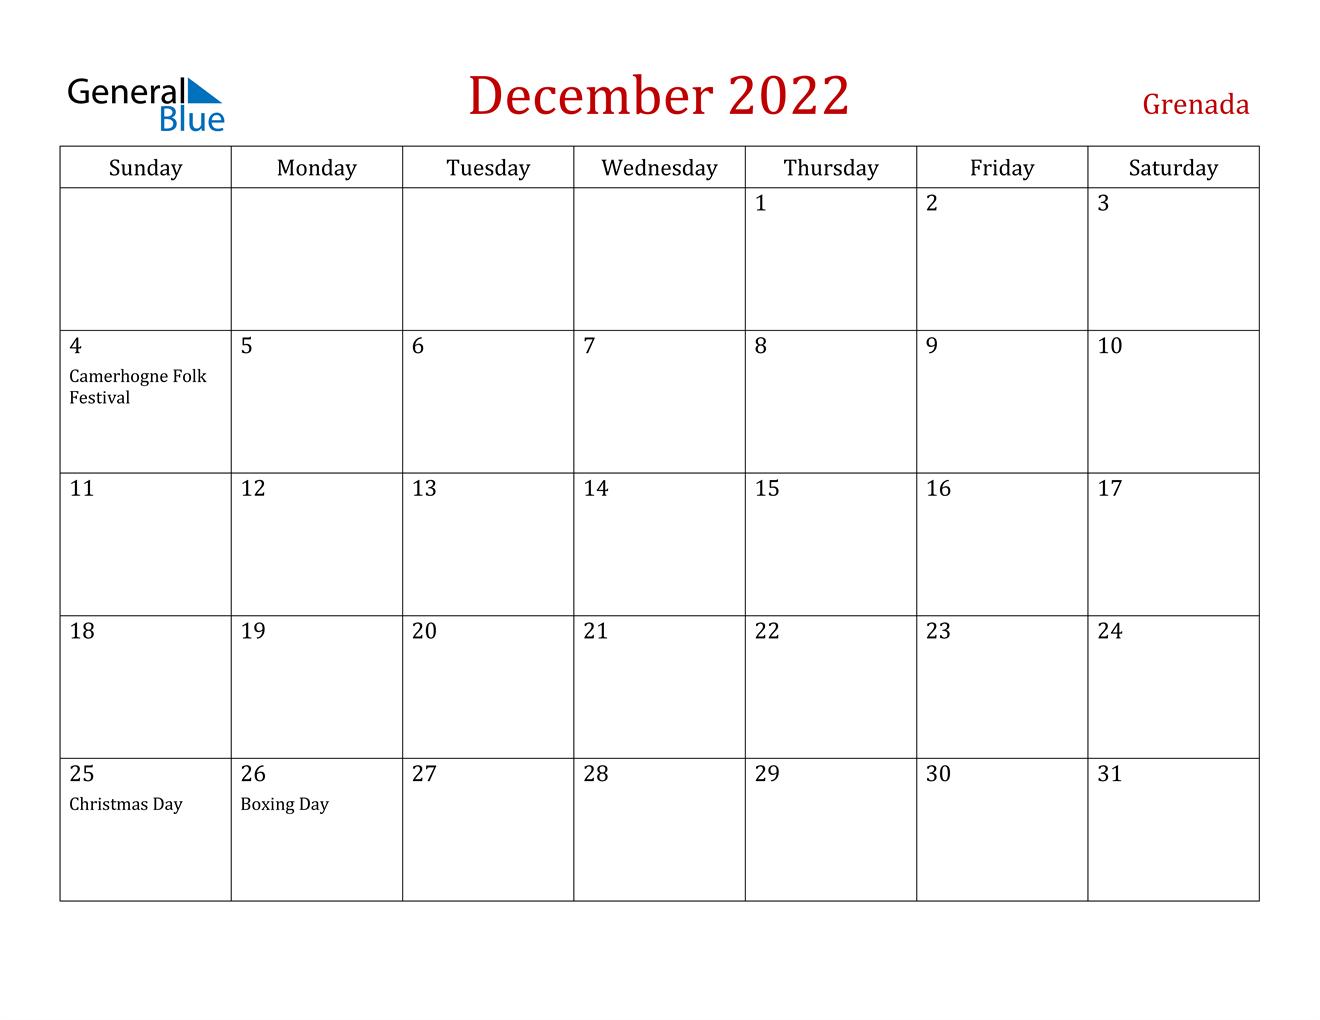 December 2022 Calendar - Grenada